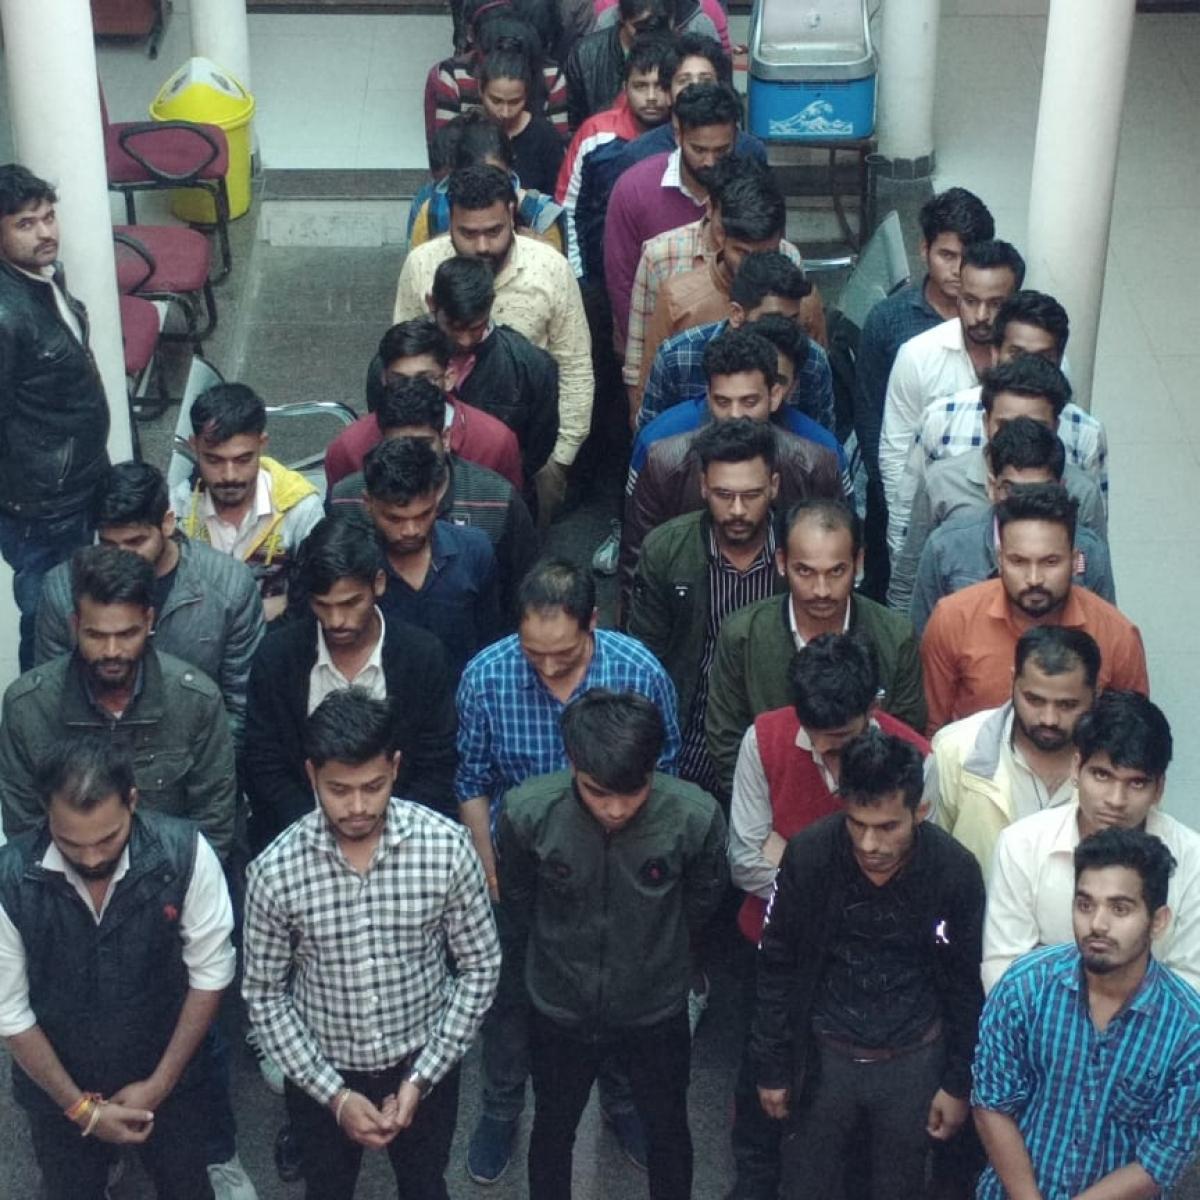 Indore: STF raids share advisory company, arrests 48